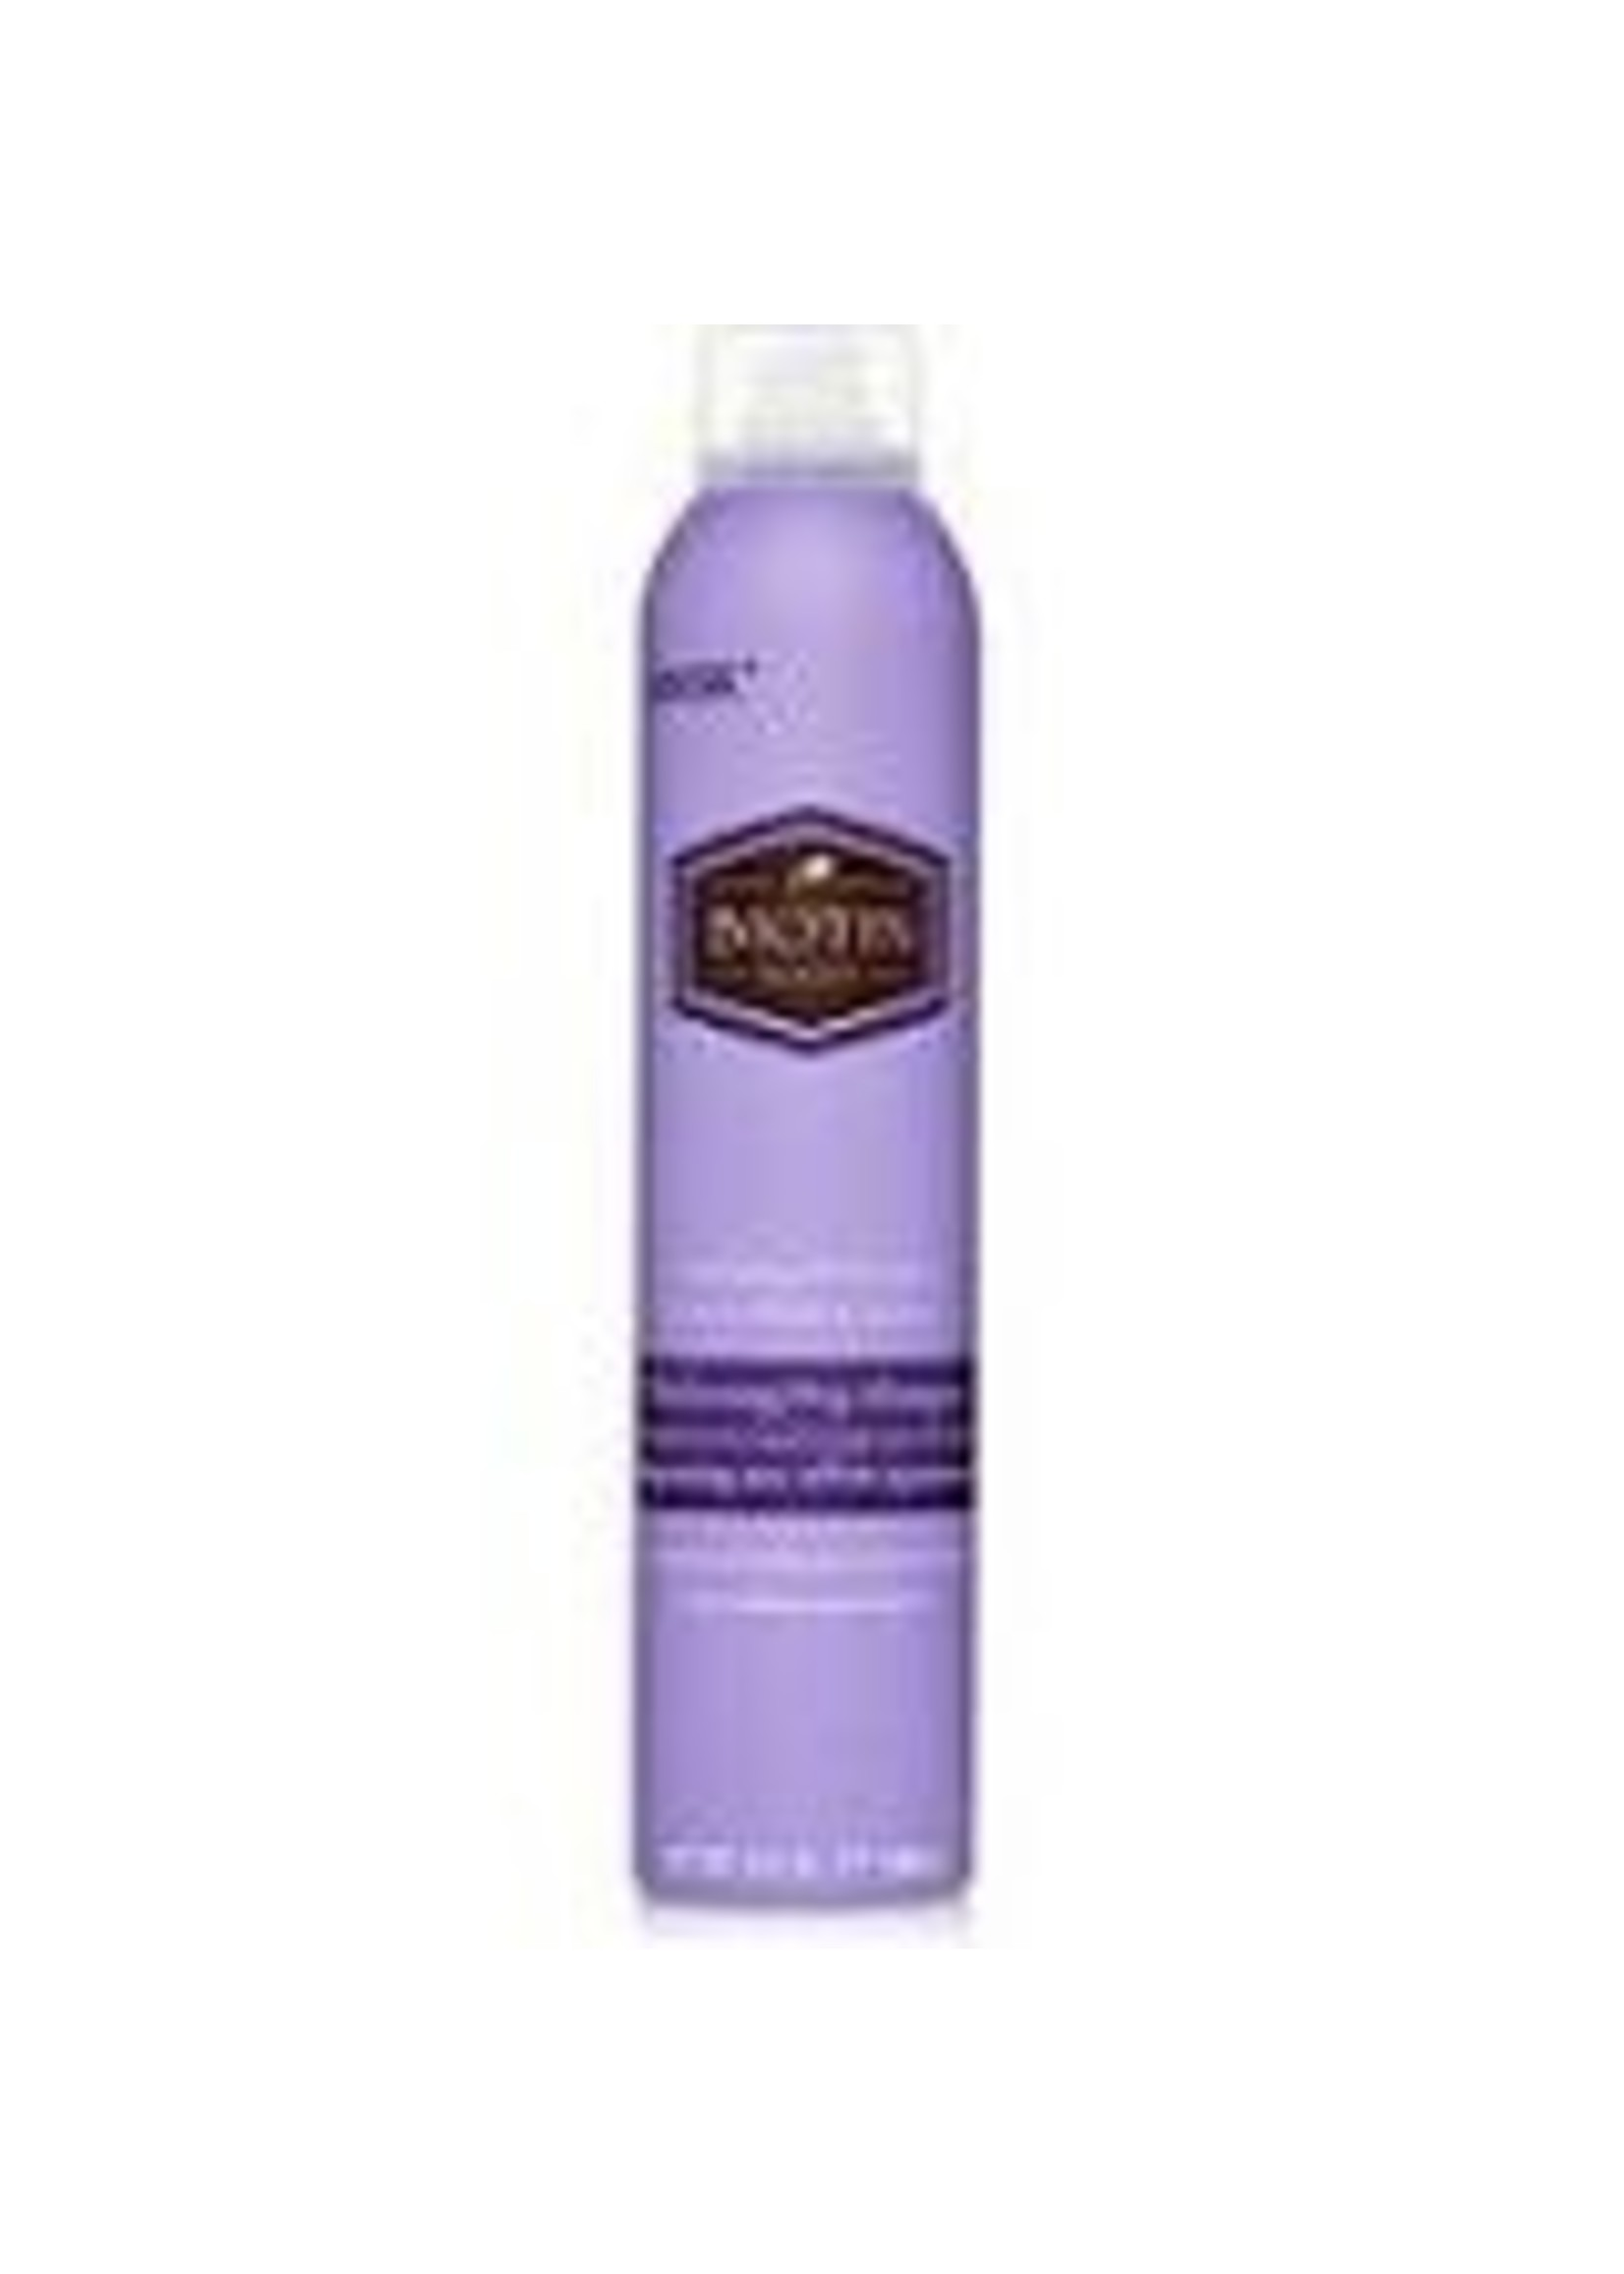 Hask Biotin Dry Shampoo 6.5oz